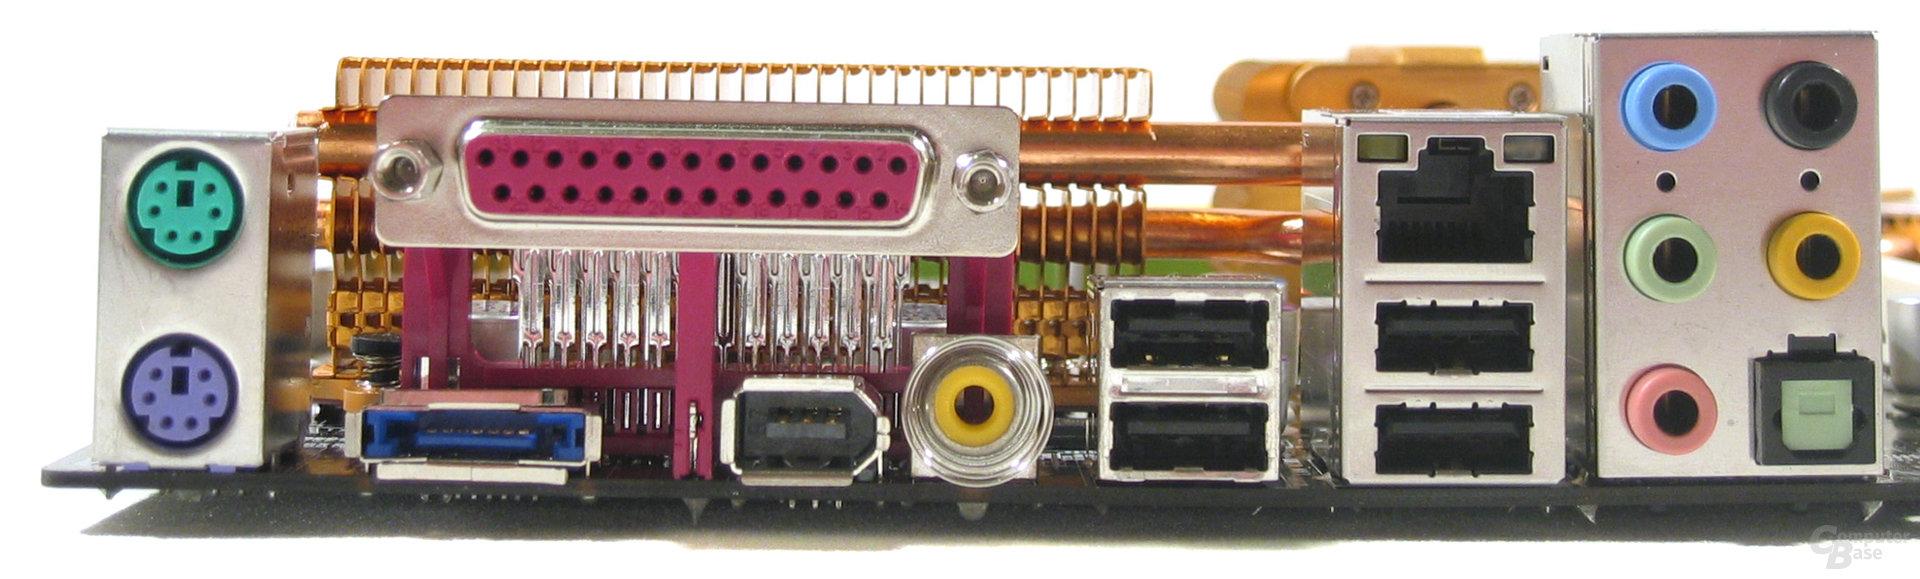 MSI P6N SLI Platinum ATX-Blende